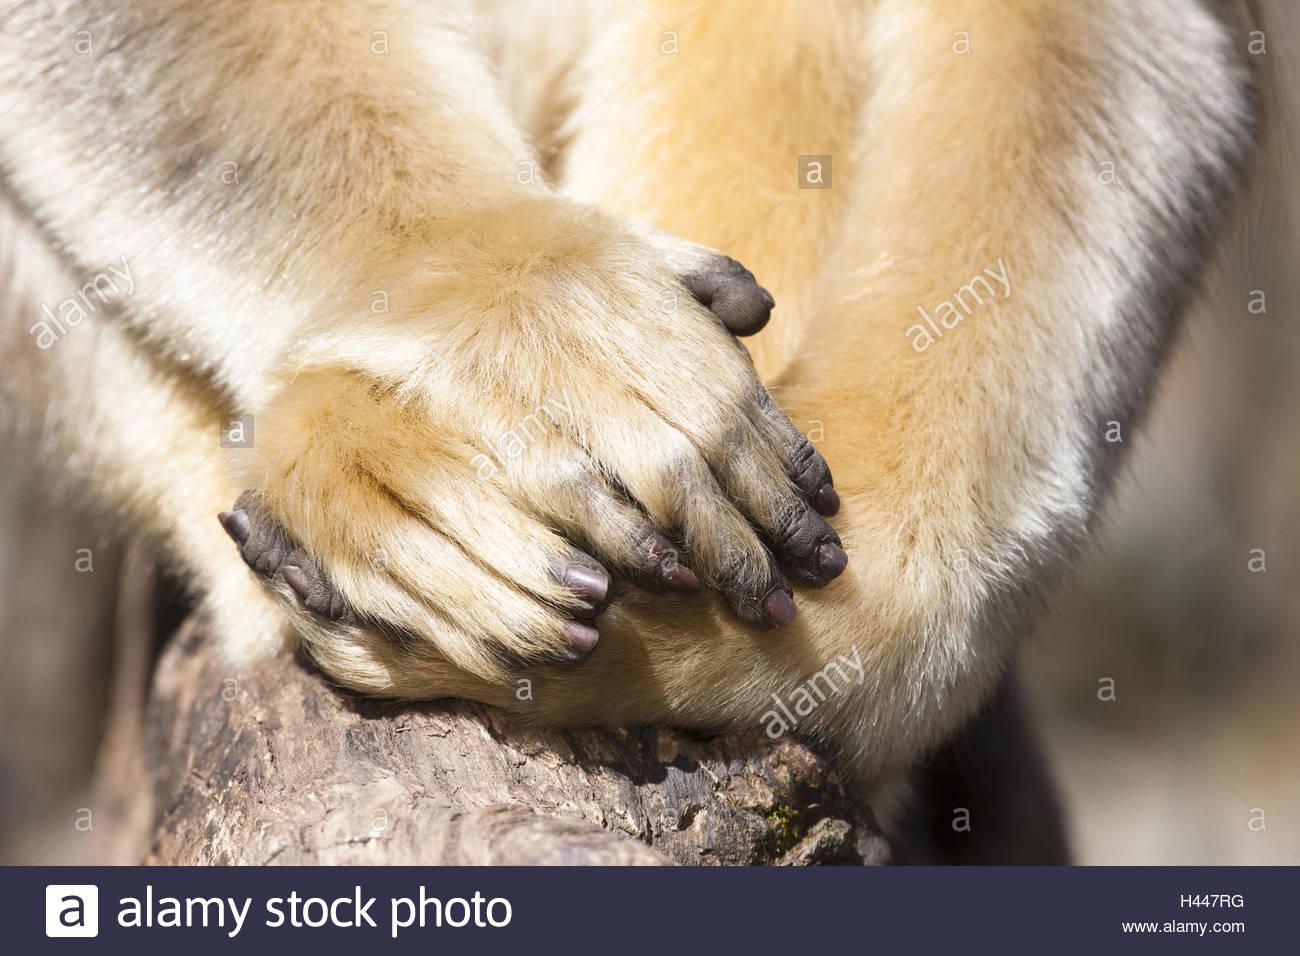 Monkey, golden snub-nosed monkeys, Rhinopithecus roxellana, detail, hands and feet, medium close-up, - Stock Image